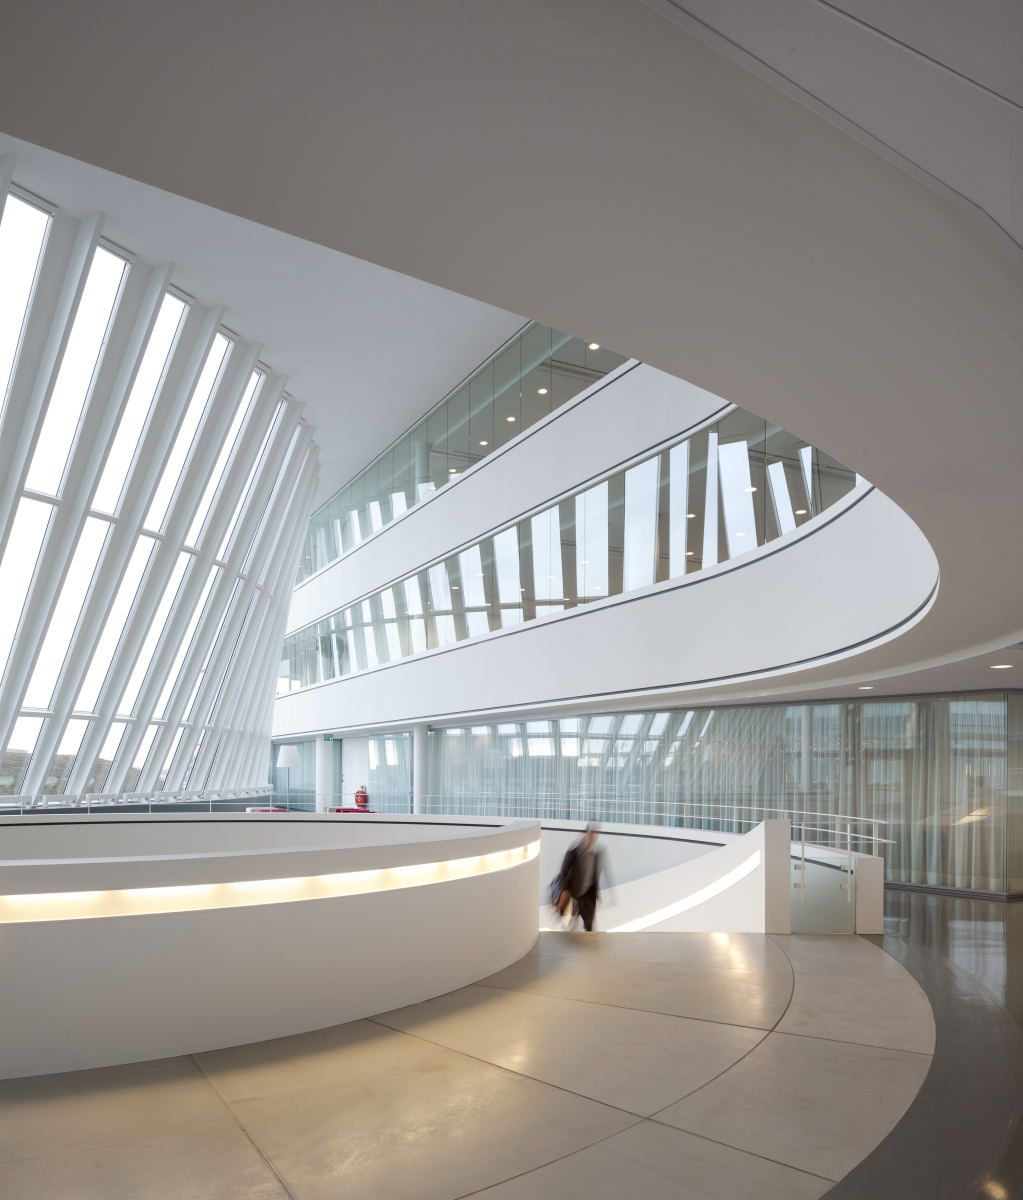 Nieuwegein city hall and cultural center nieuwegein for Idee architettura interni